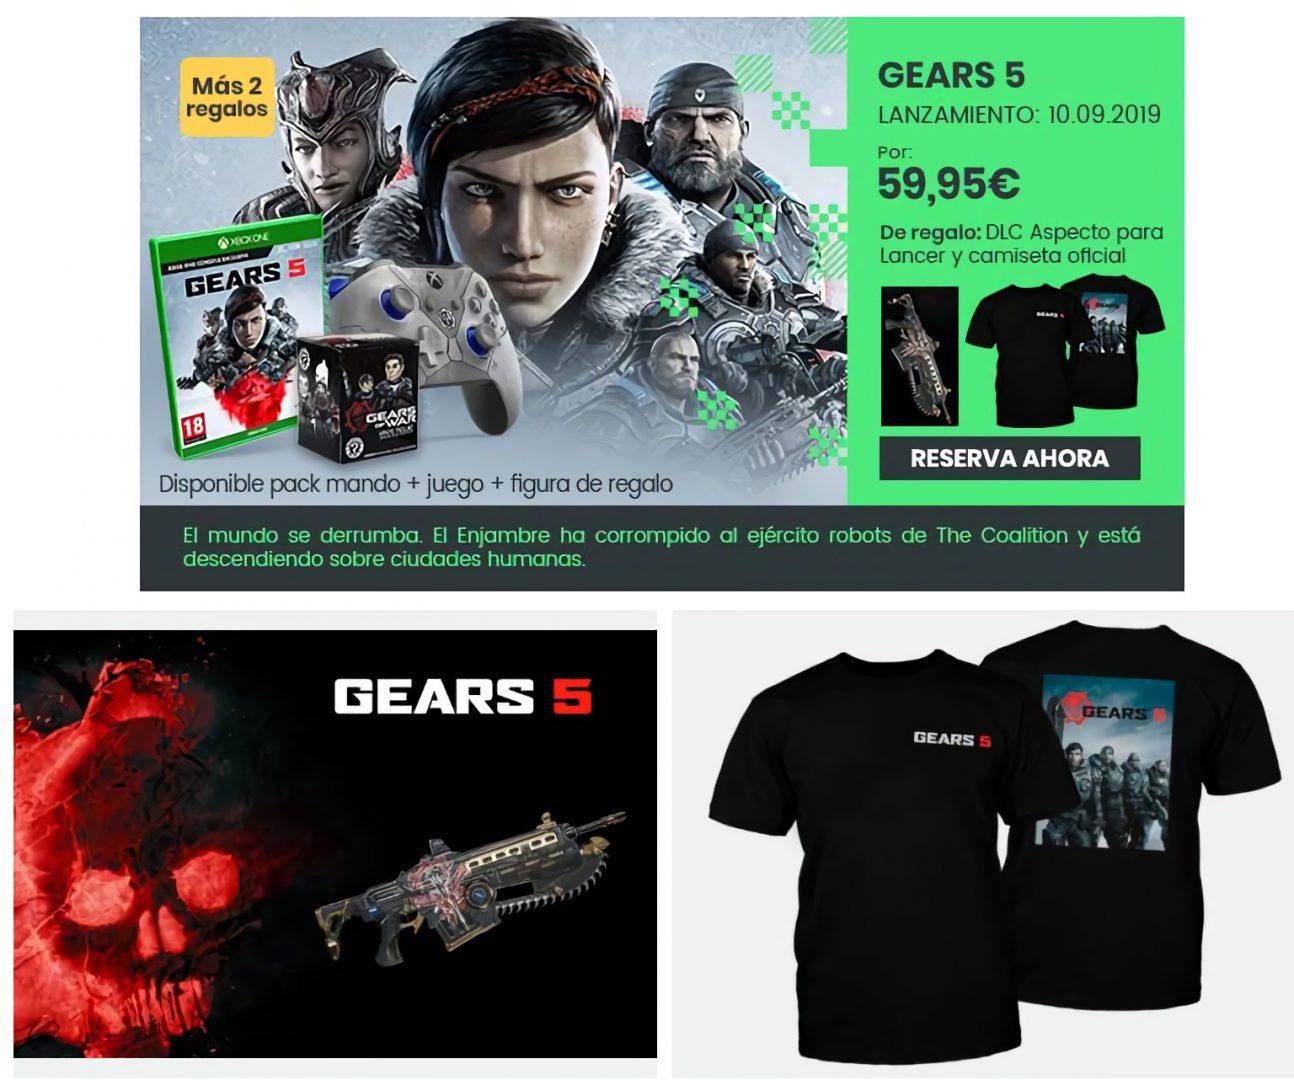 Gears 5 Xtralife